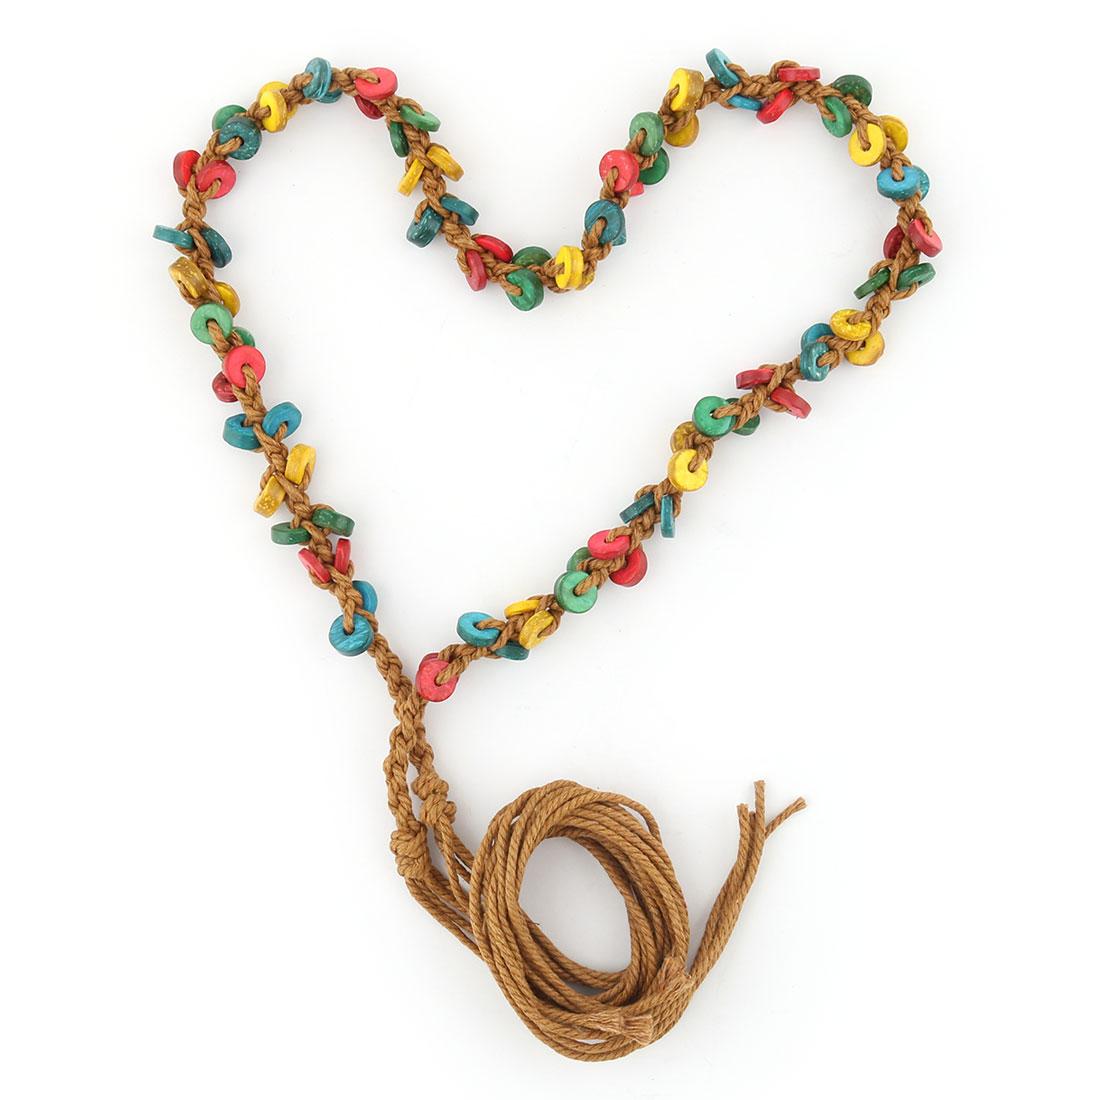 Ladies Wooden Retro Style Decoration Handmade Chain Tie Waistband Belt Multicolor